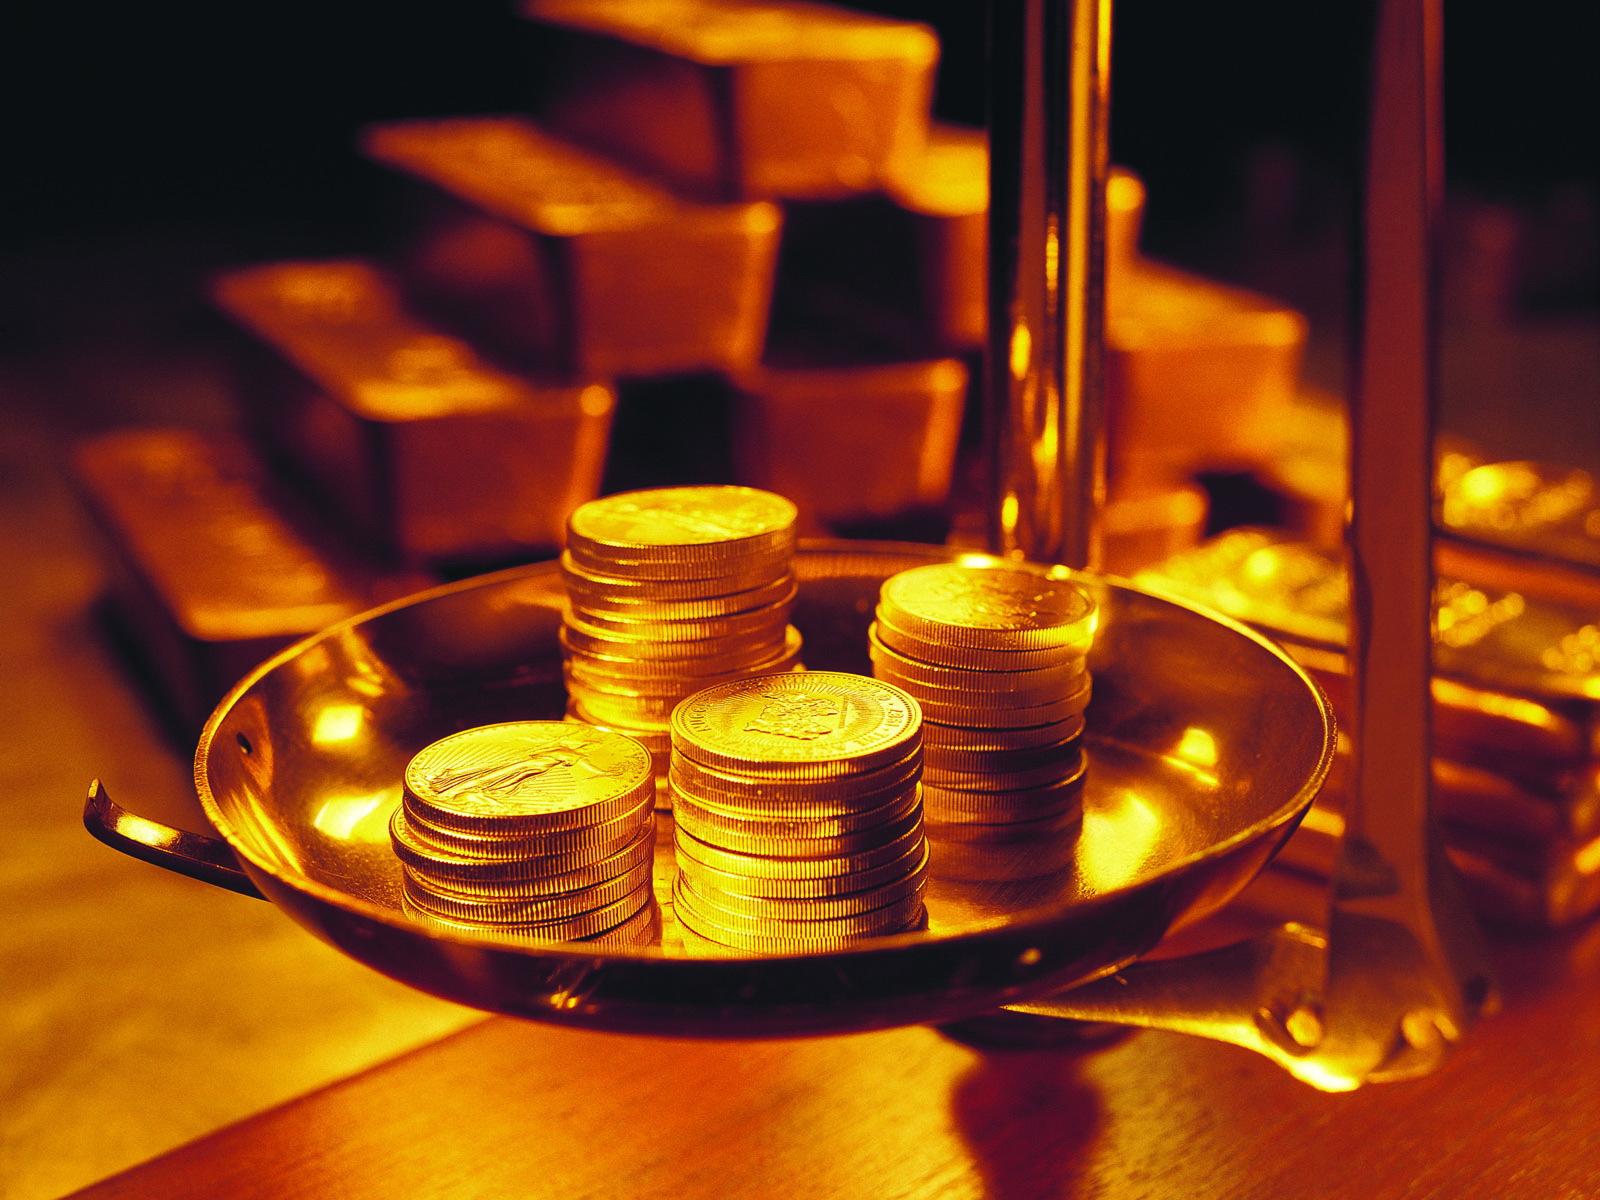 Какие критерии помогут инвесторам в золото и серебро?